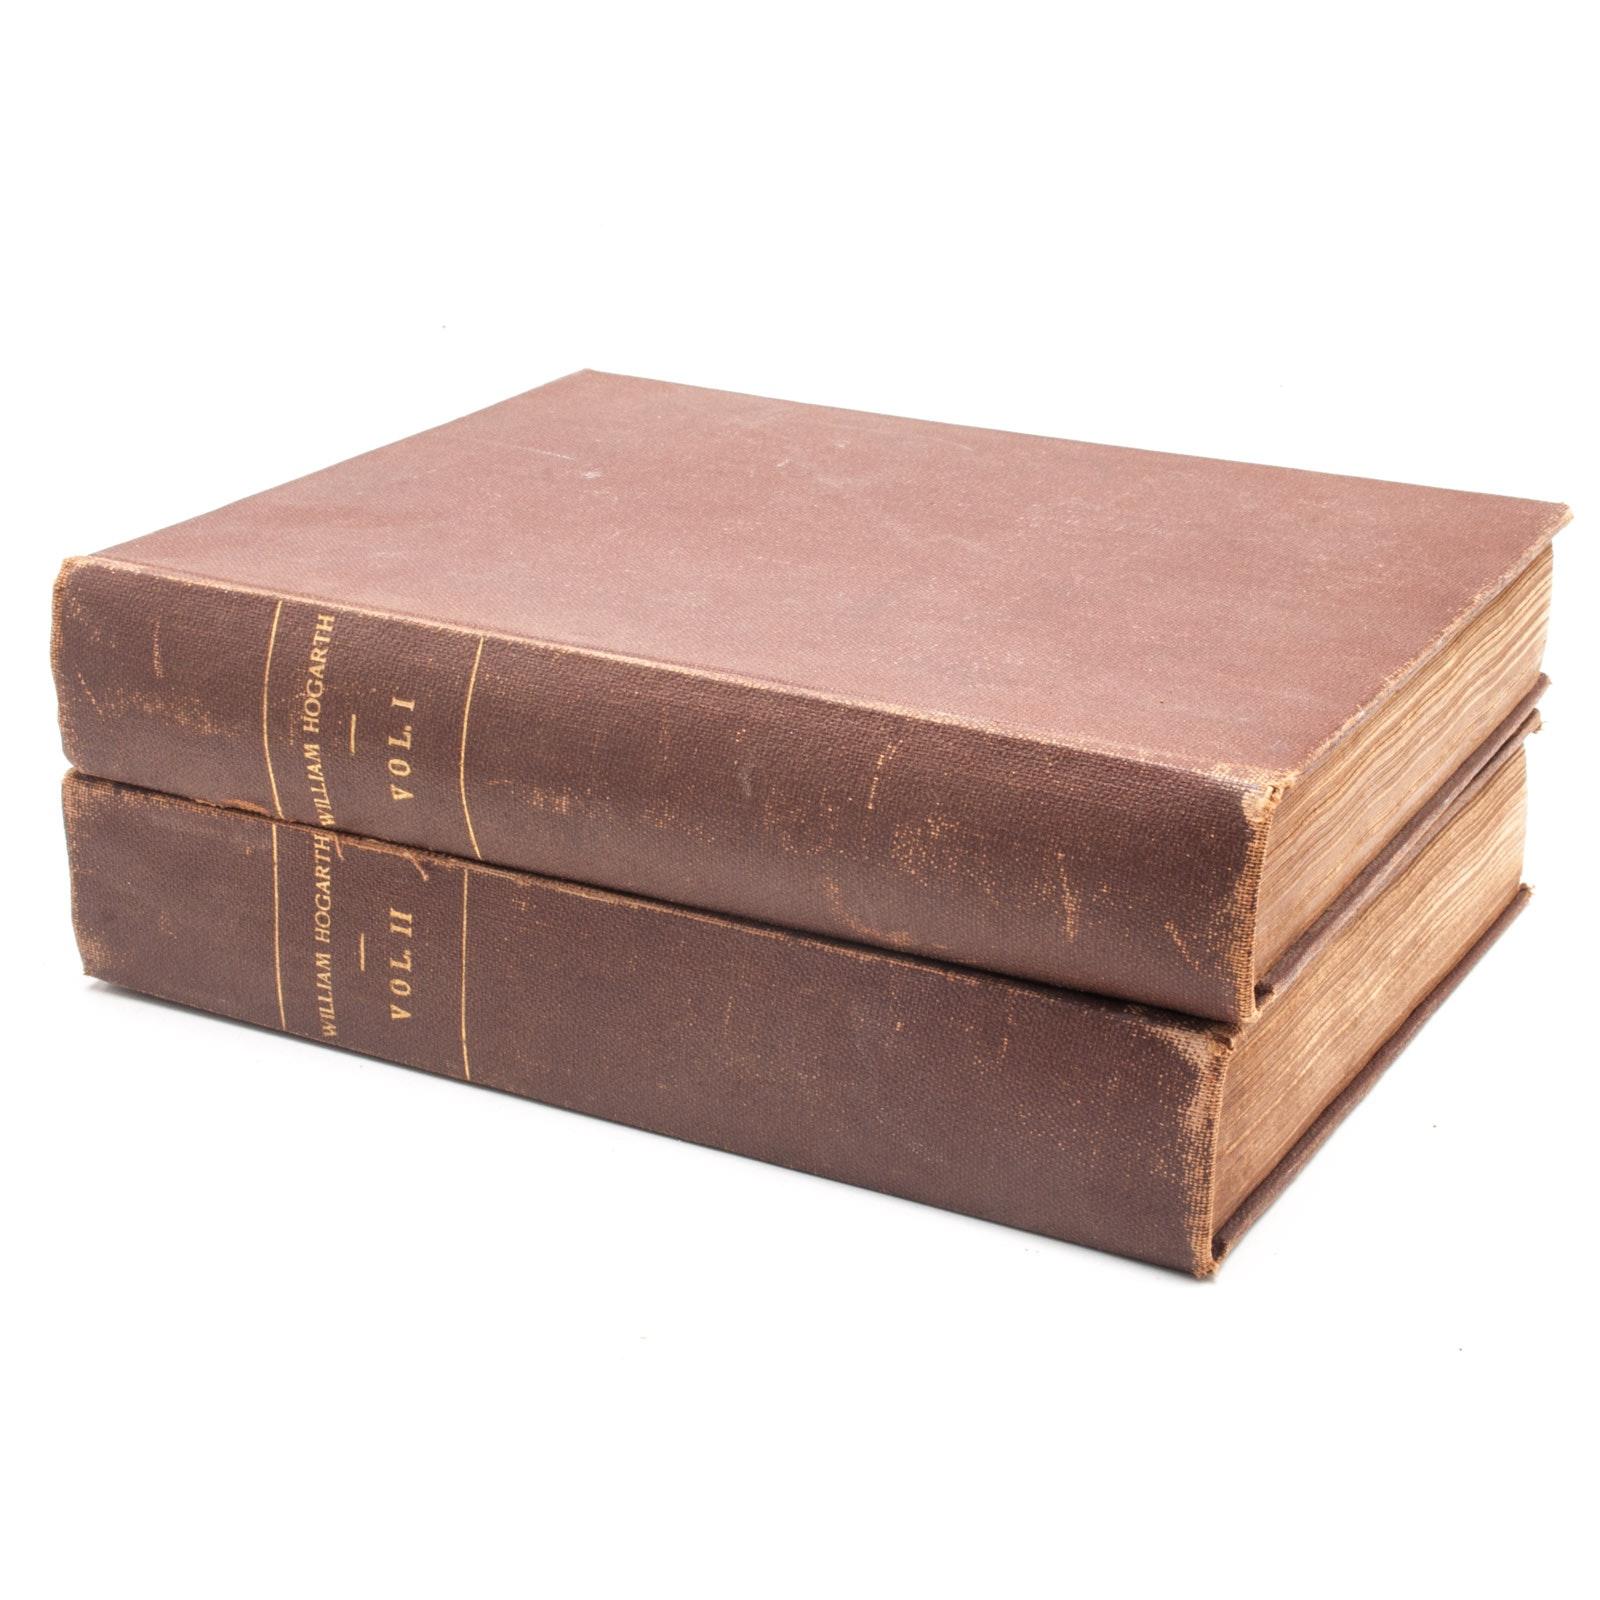 Pair of Antique Volumes of the Works of William Hogarth